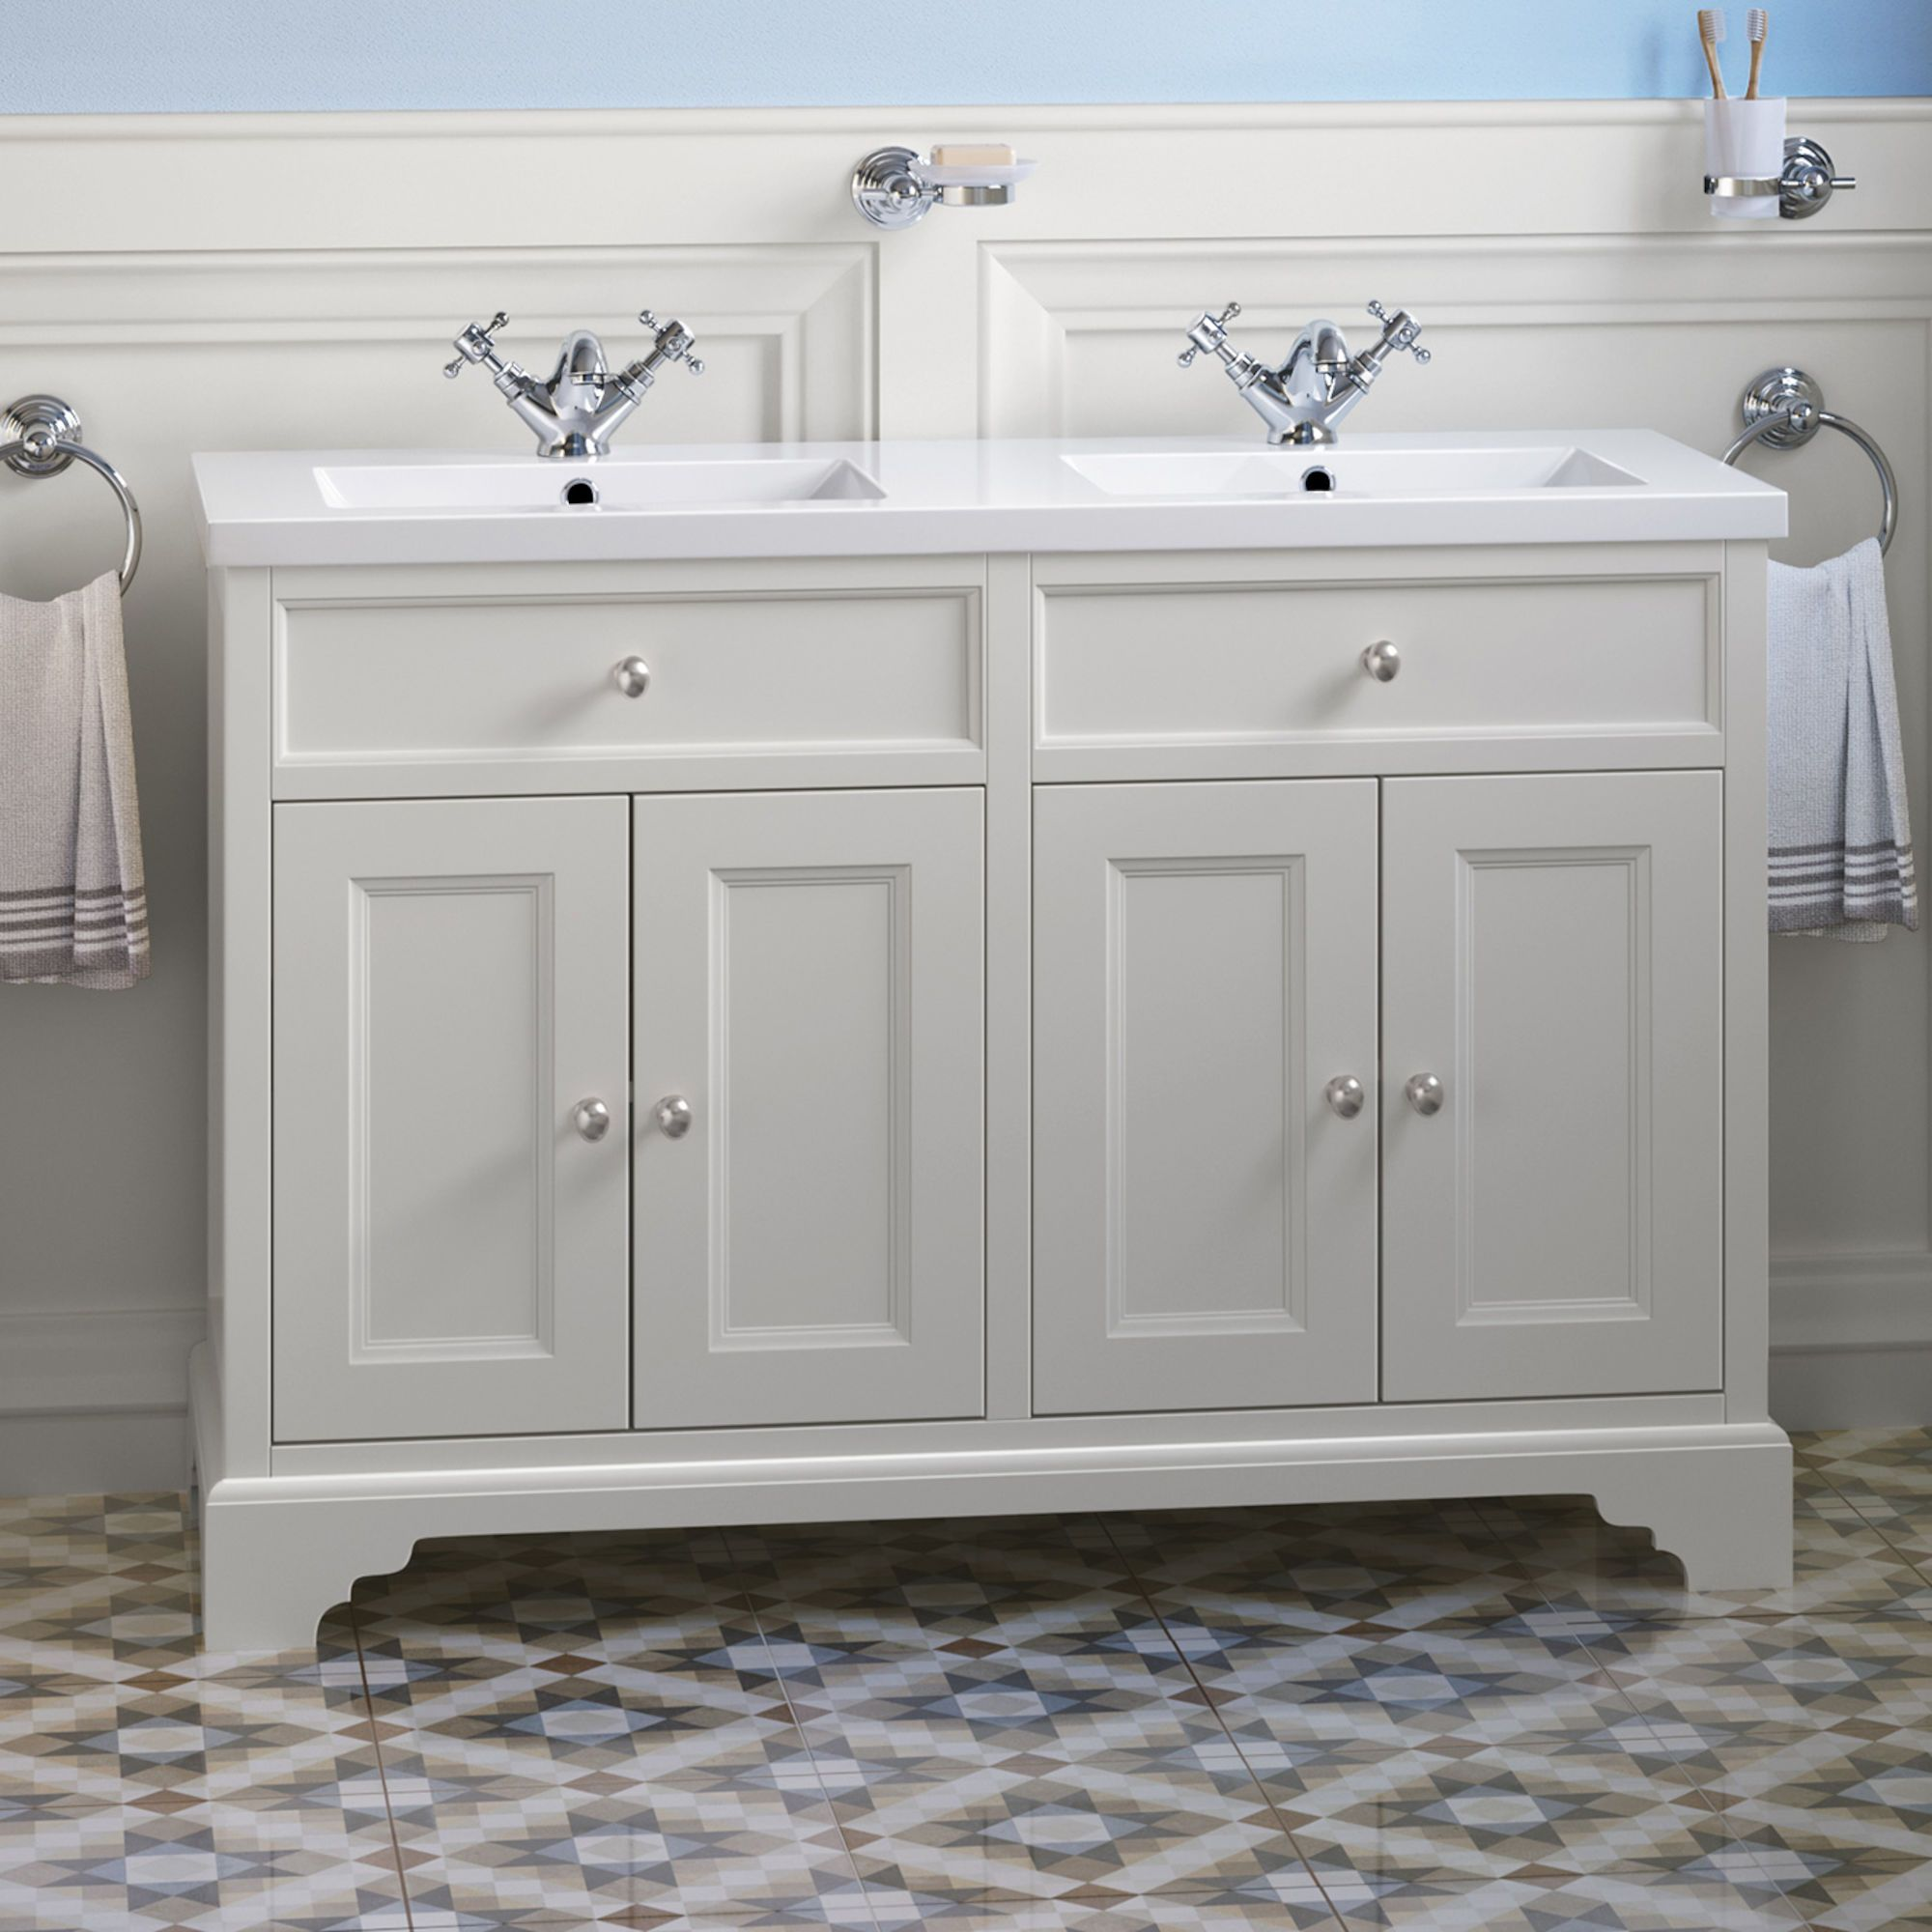 1200mm Loxley Chalk Double Basin Vanity Unit Floor Standing Vanity Units Sink Vanity Unit Bathroom Units